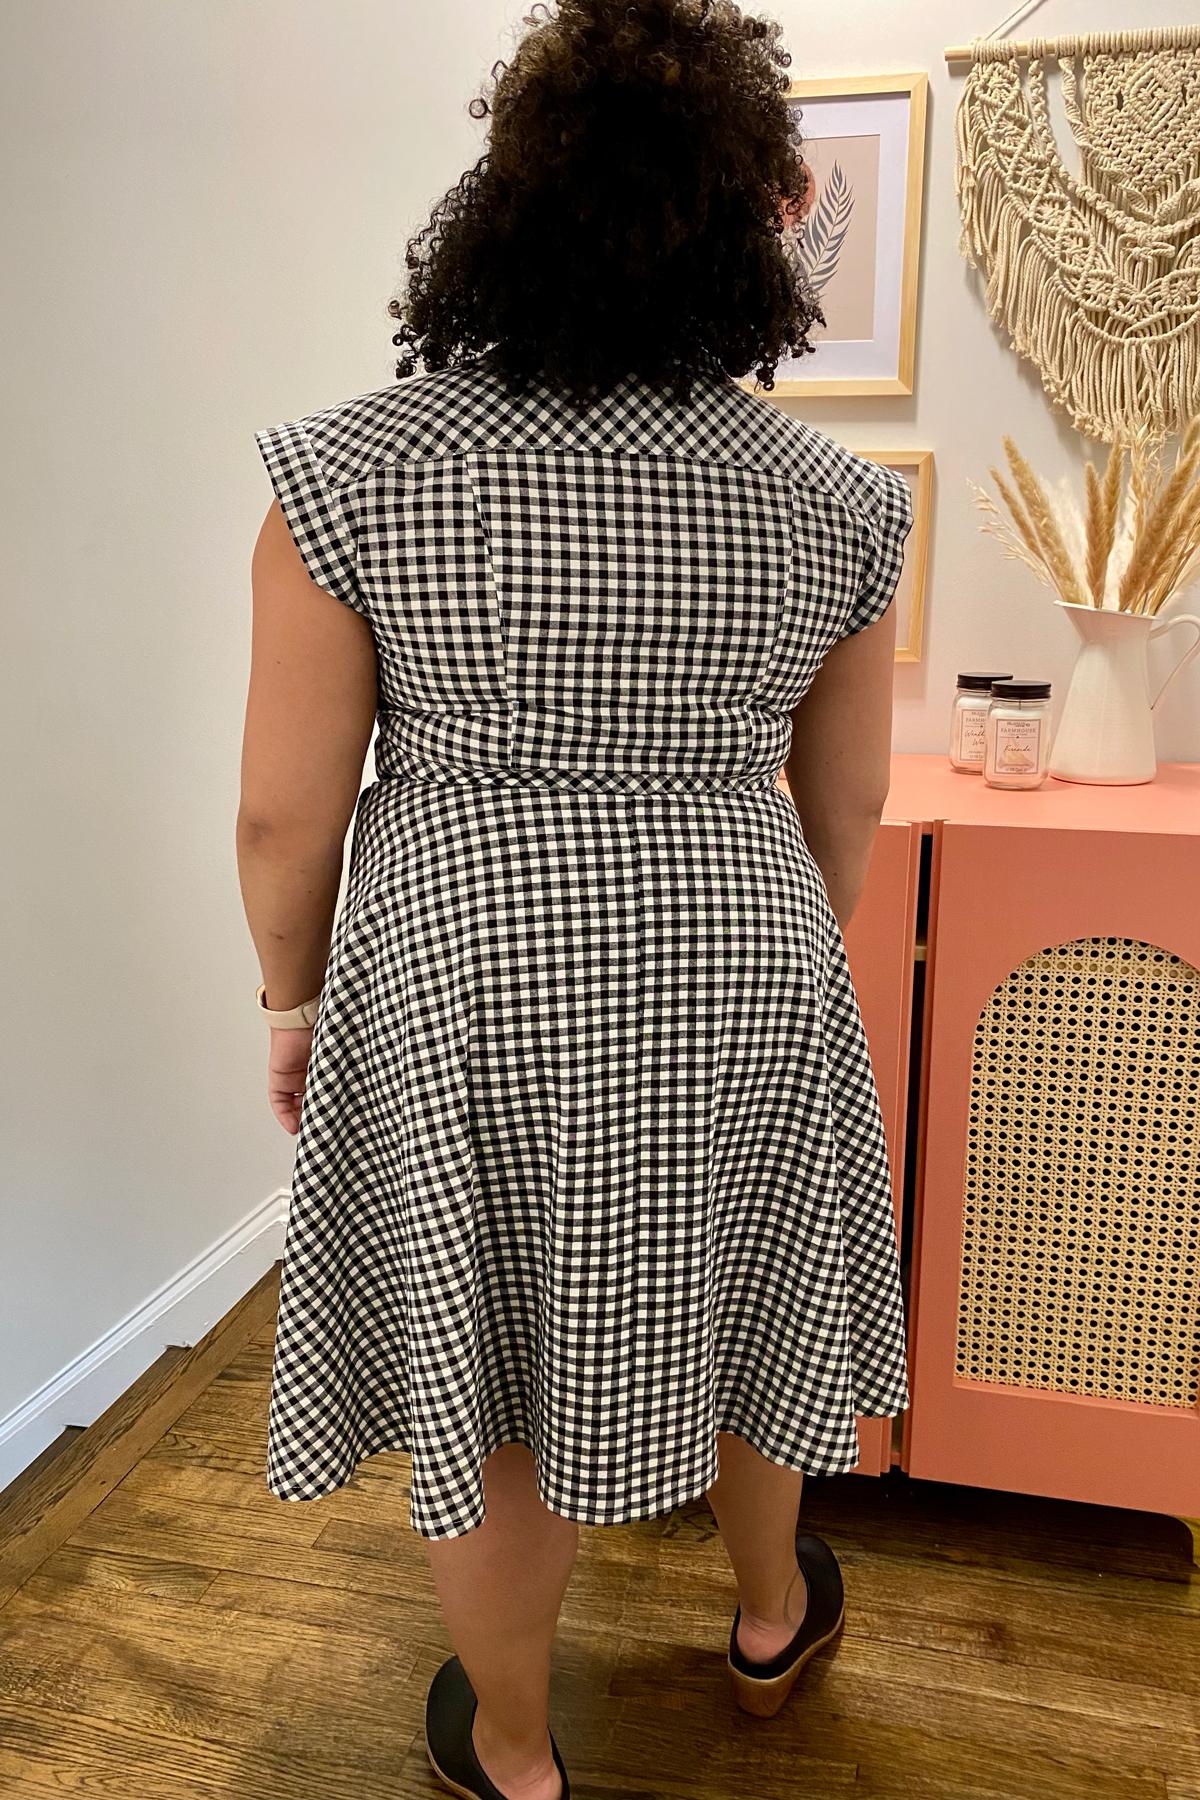 Mia's Matilda Curve Tester Make